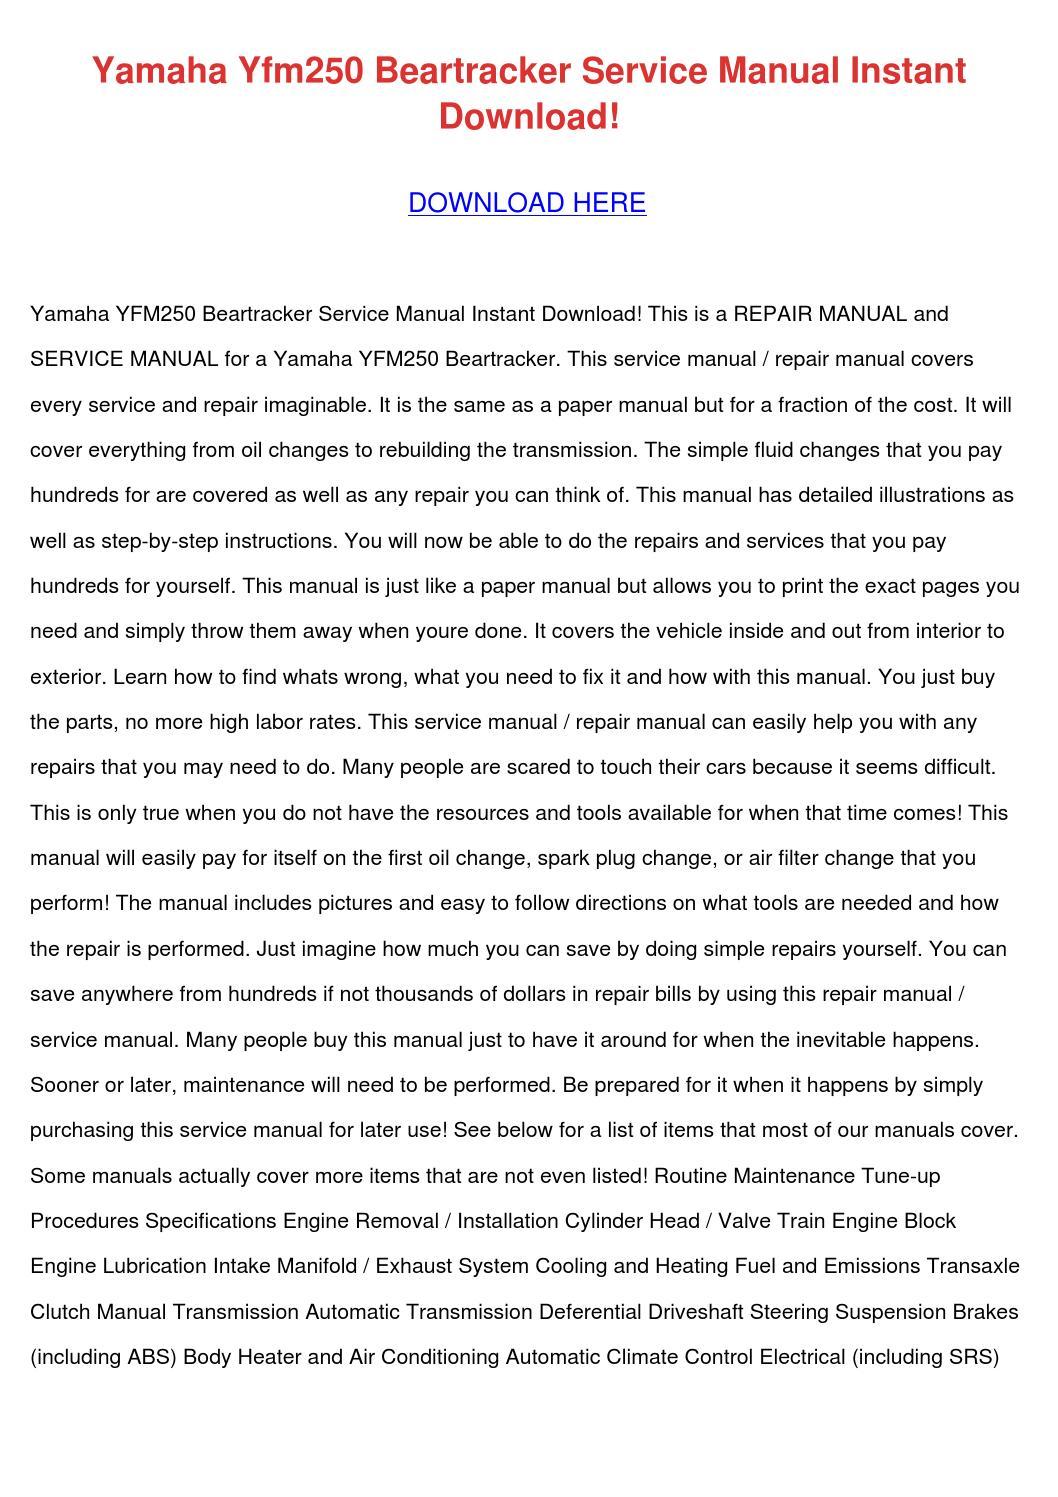 Yamaha Yfm250 Beartracker Service Manual Inst by TerrenceStevens ...